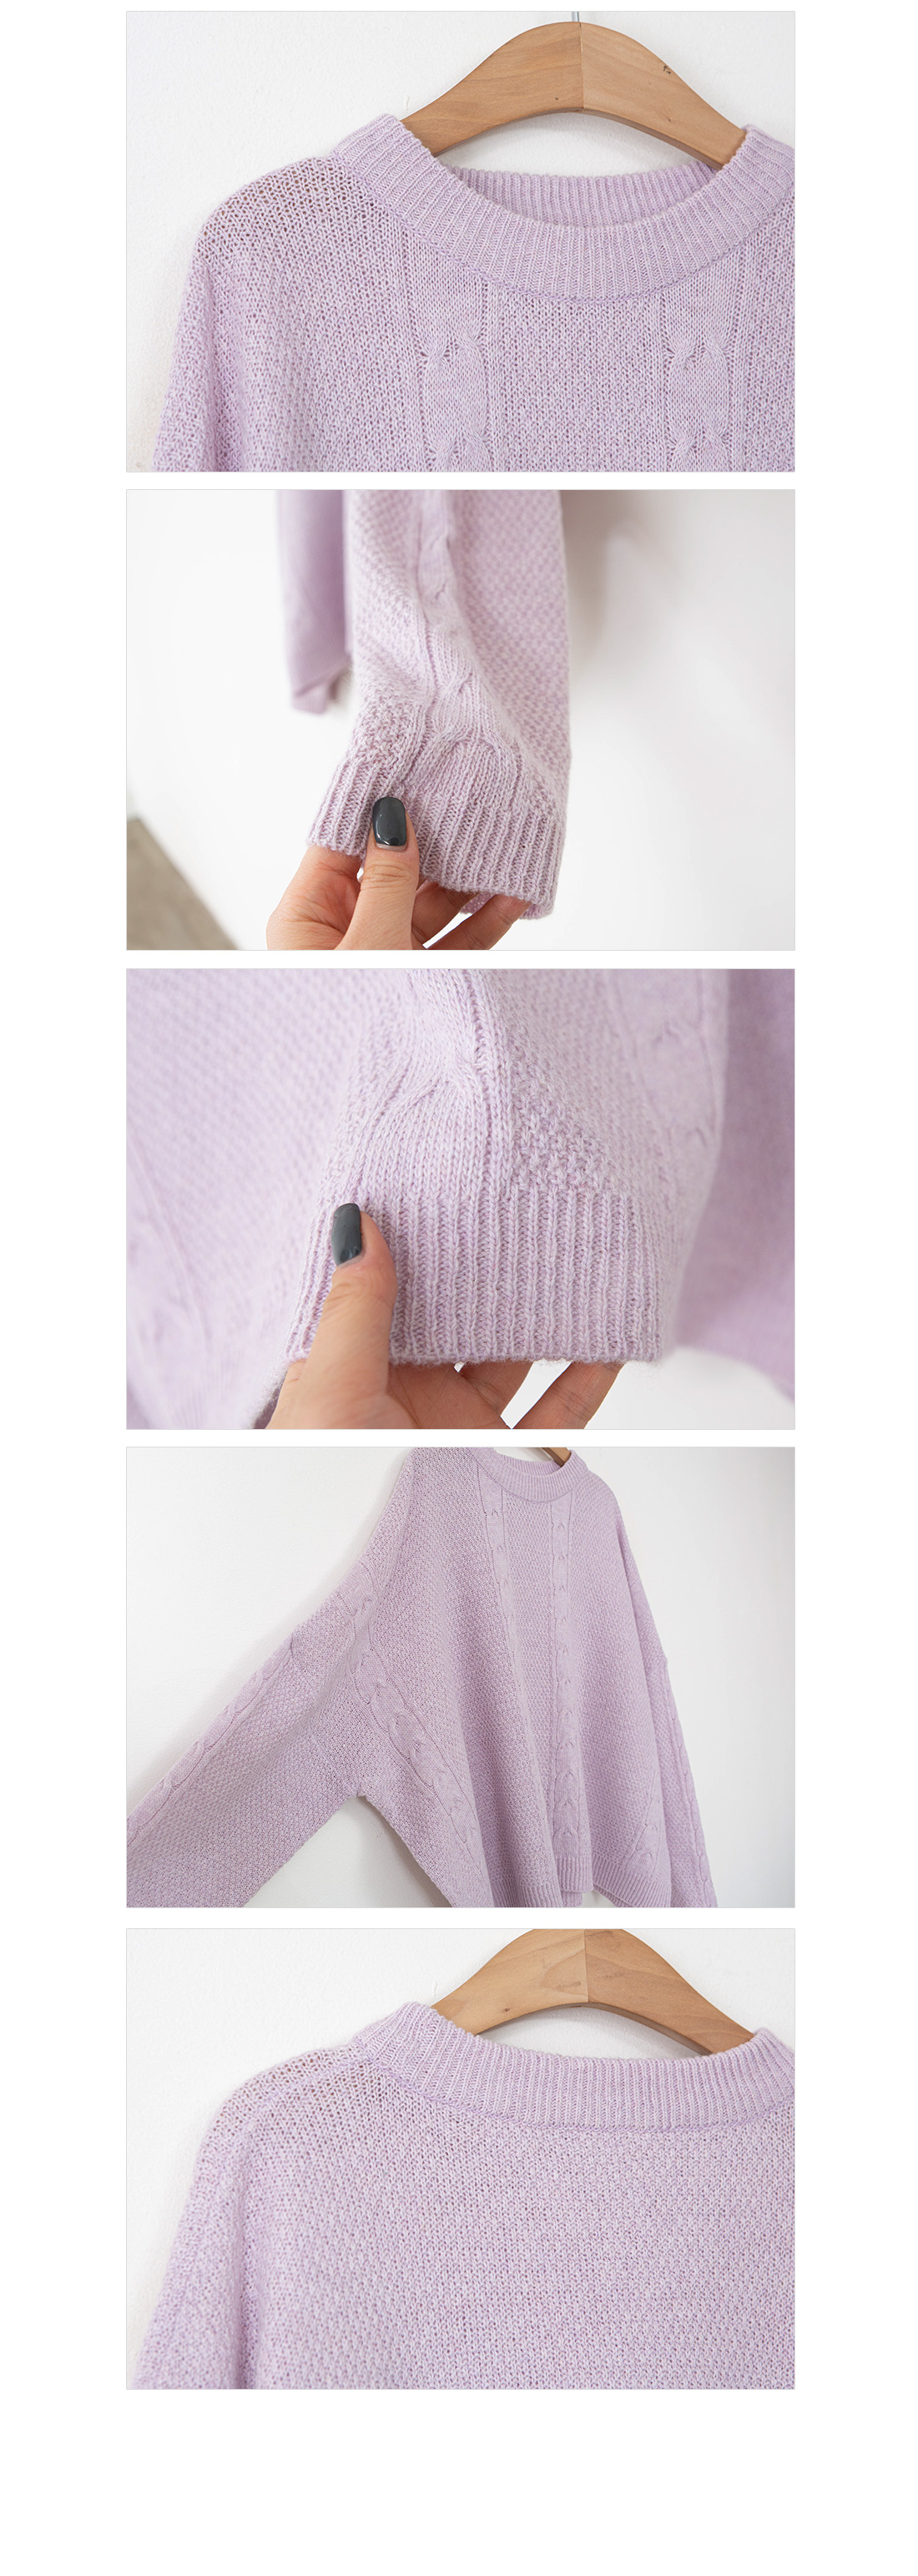 Lambcotton Diamant Knit #107926